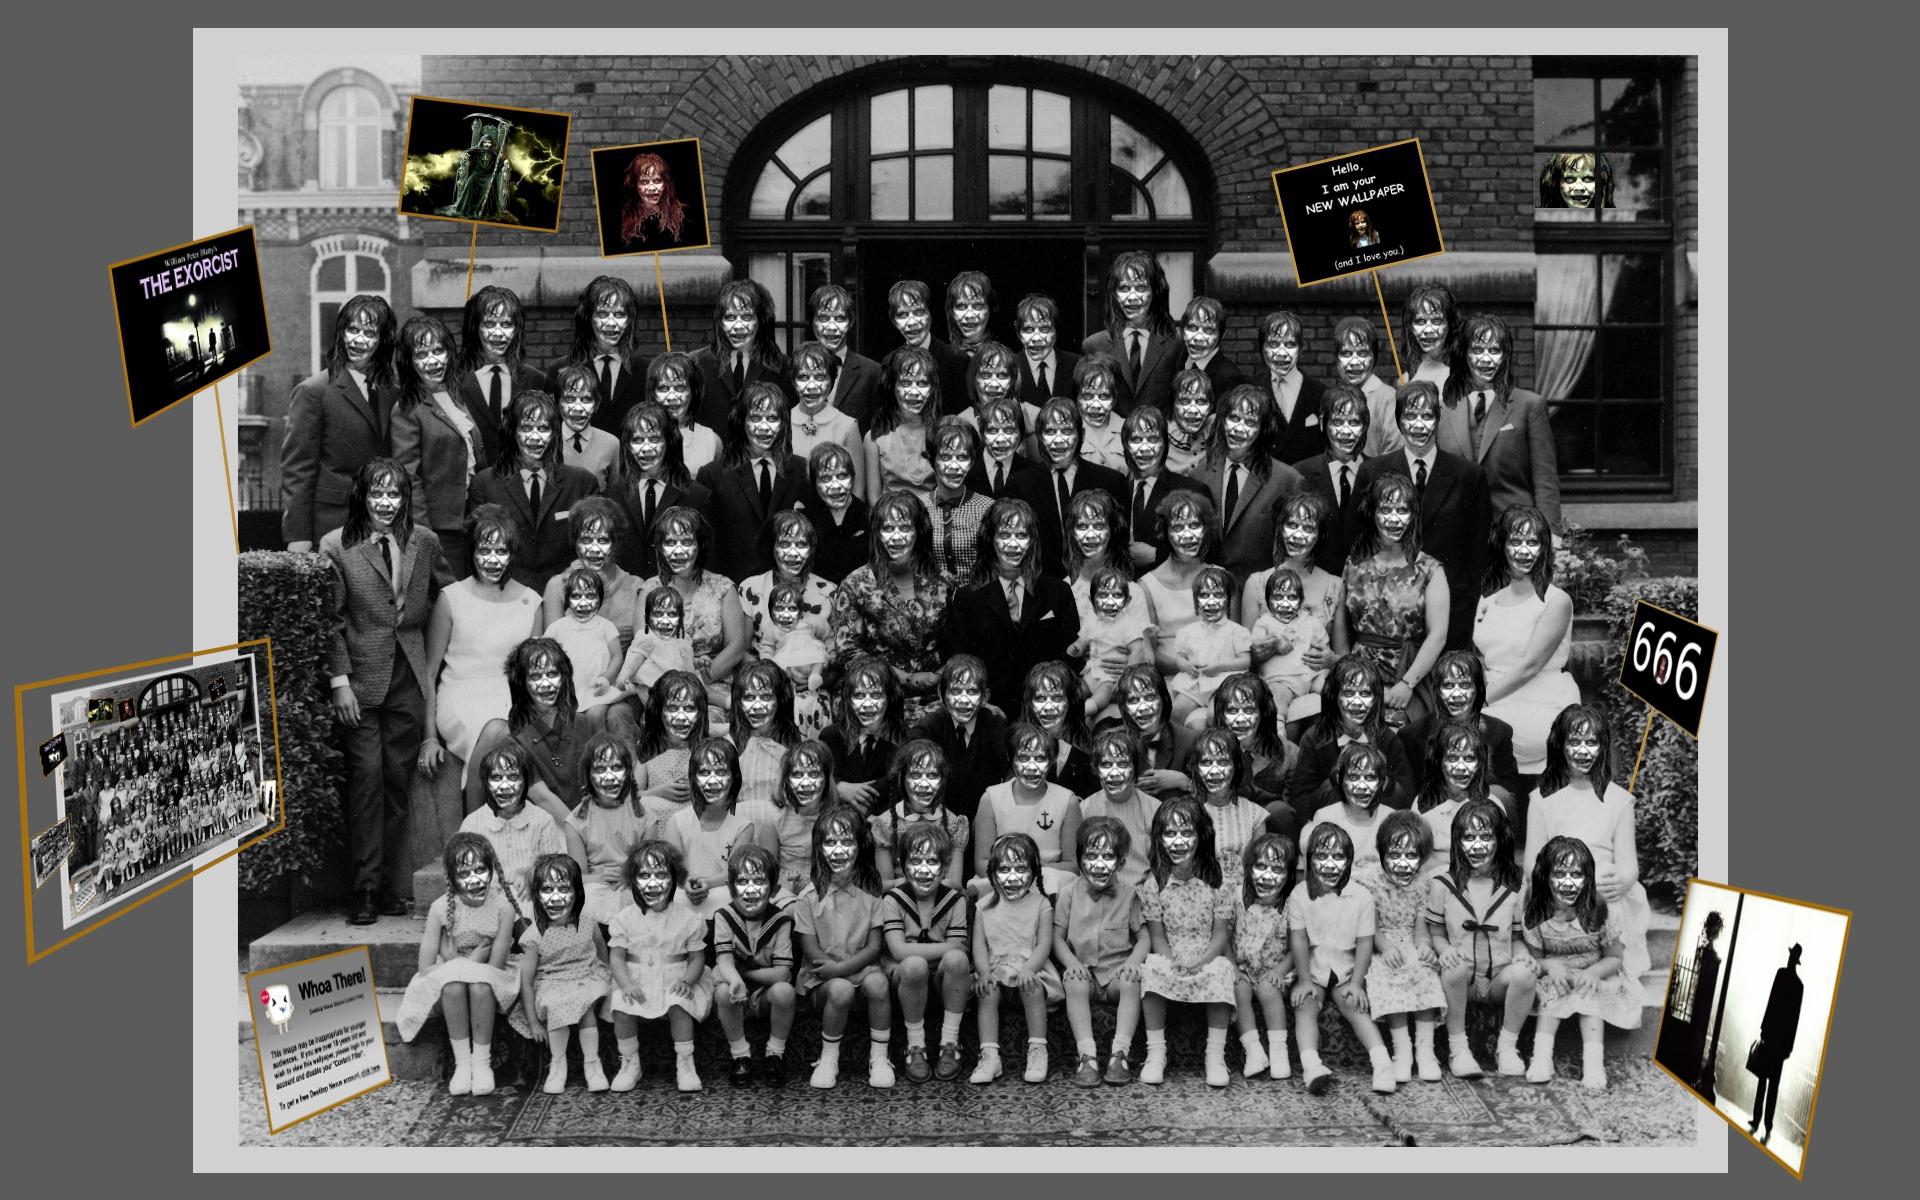 The Exorcist S Family The Exorcist Wallpaper 34302870 Fanpop